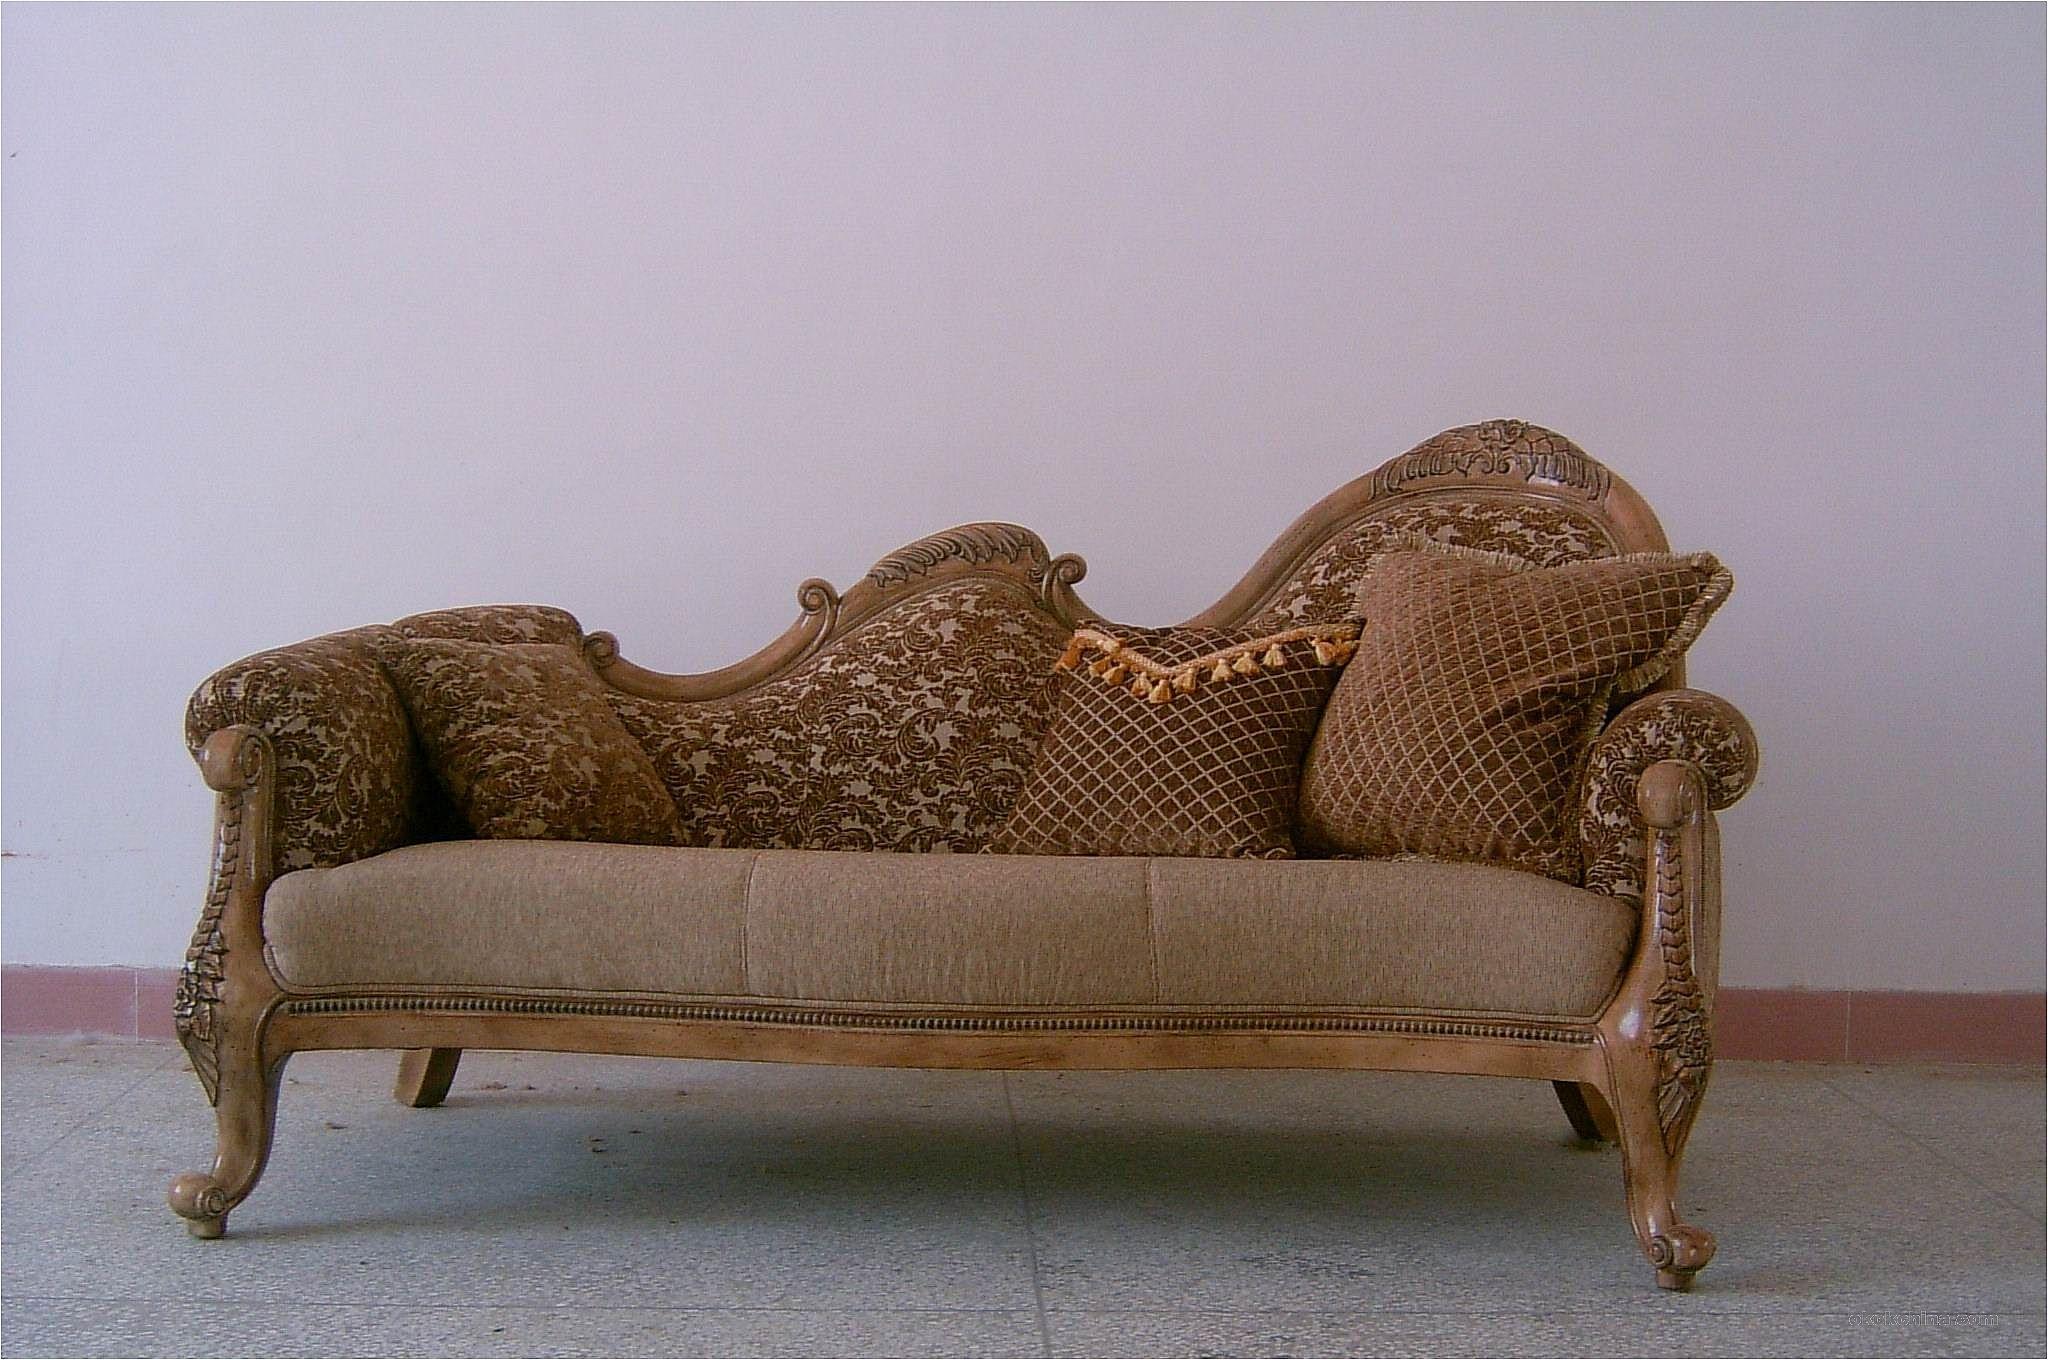 Sofa Sleepers at Slumberland Slumberland Como Chair Sofa Bed